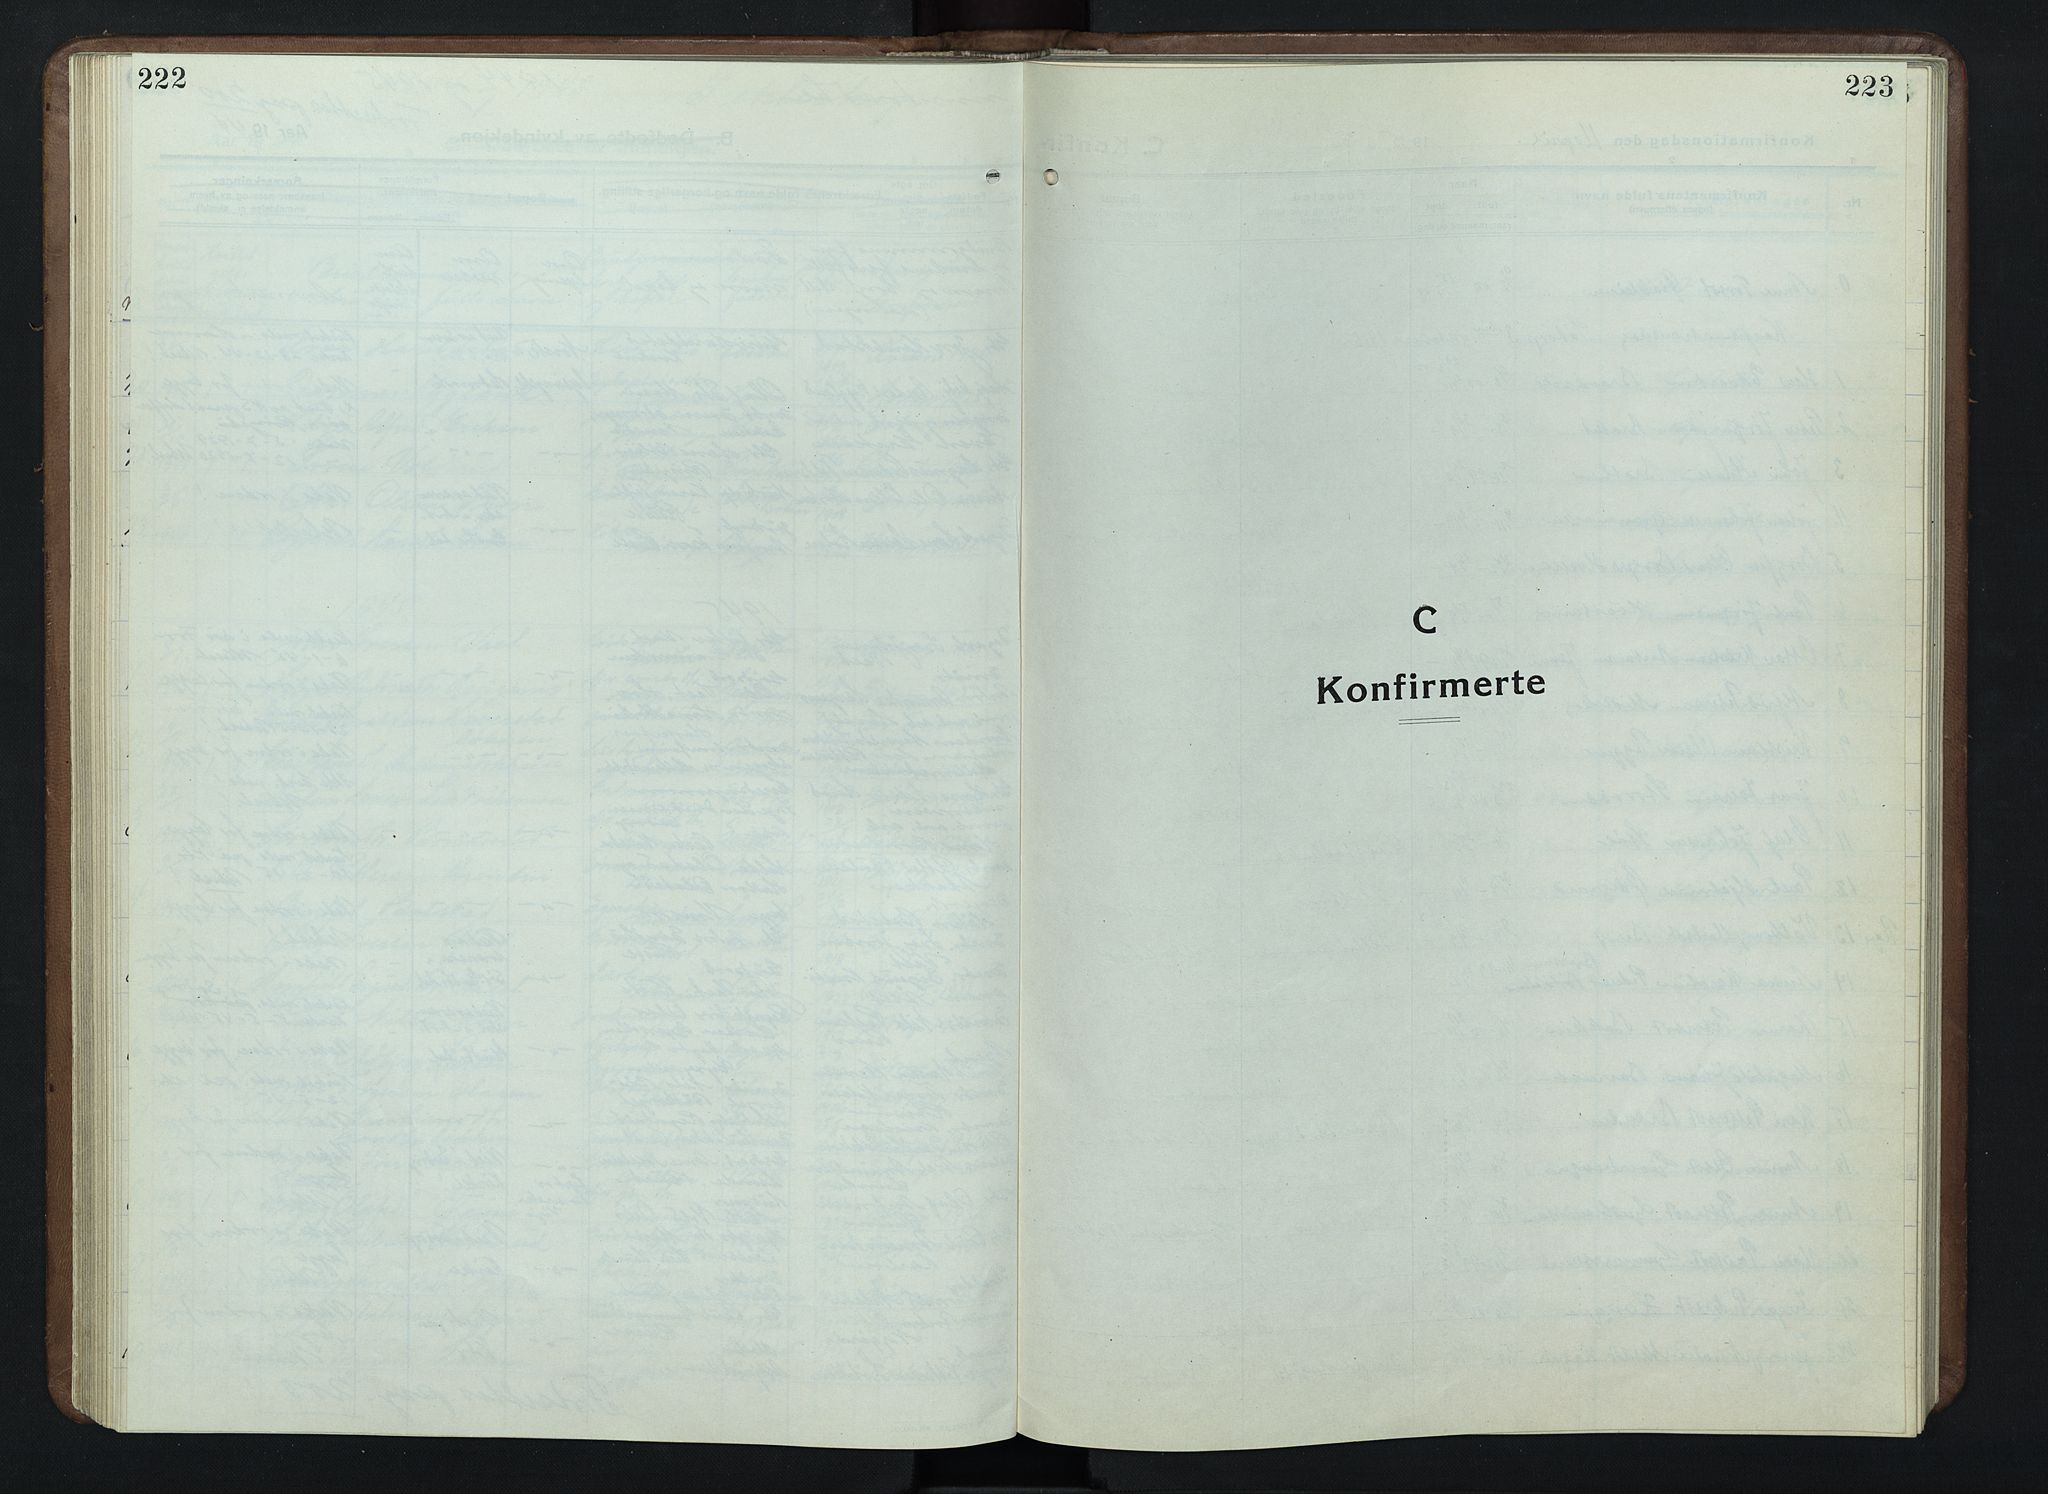 SAH, Nord-Fron prestekontor, Klokkerbok nr. 7, 1915-1946, s. 222-223